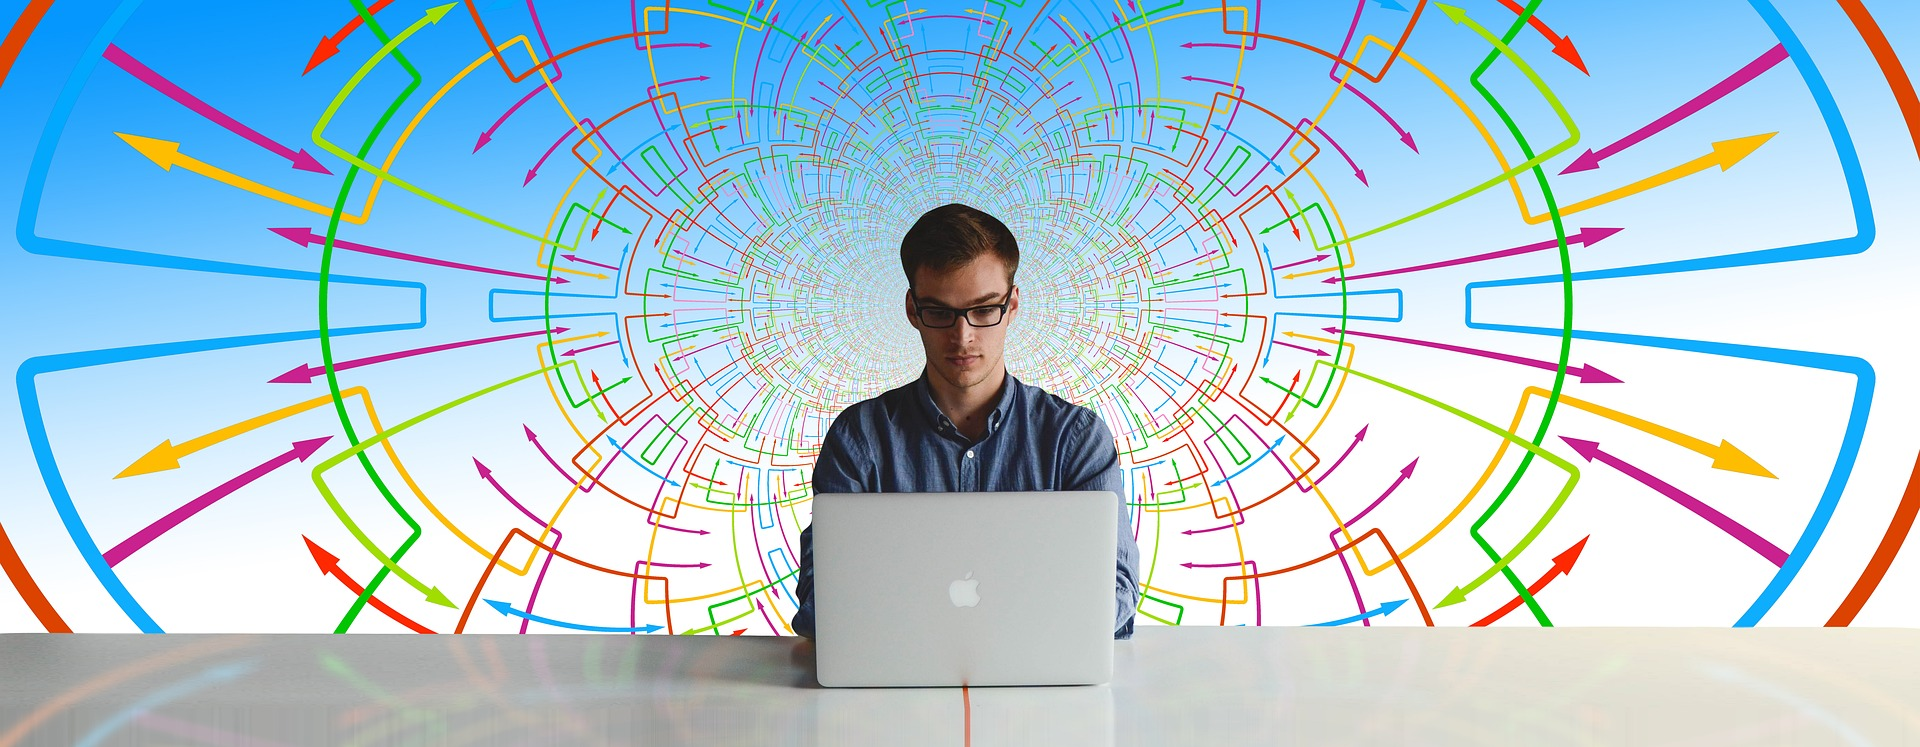 Director of Digital at his desk